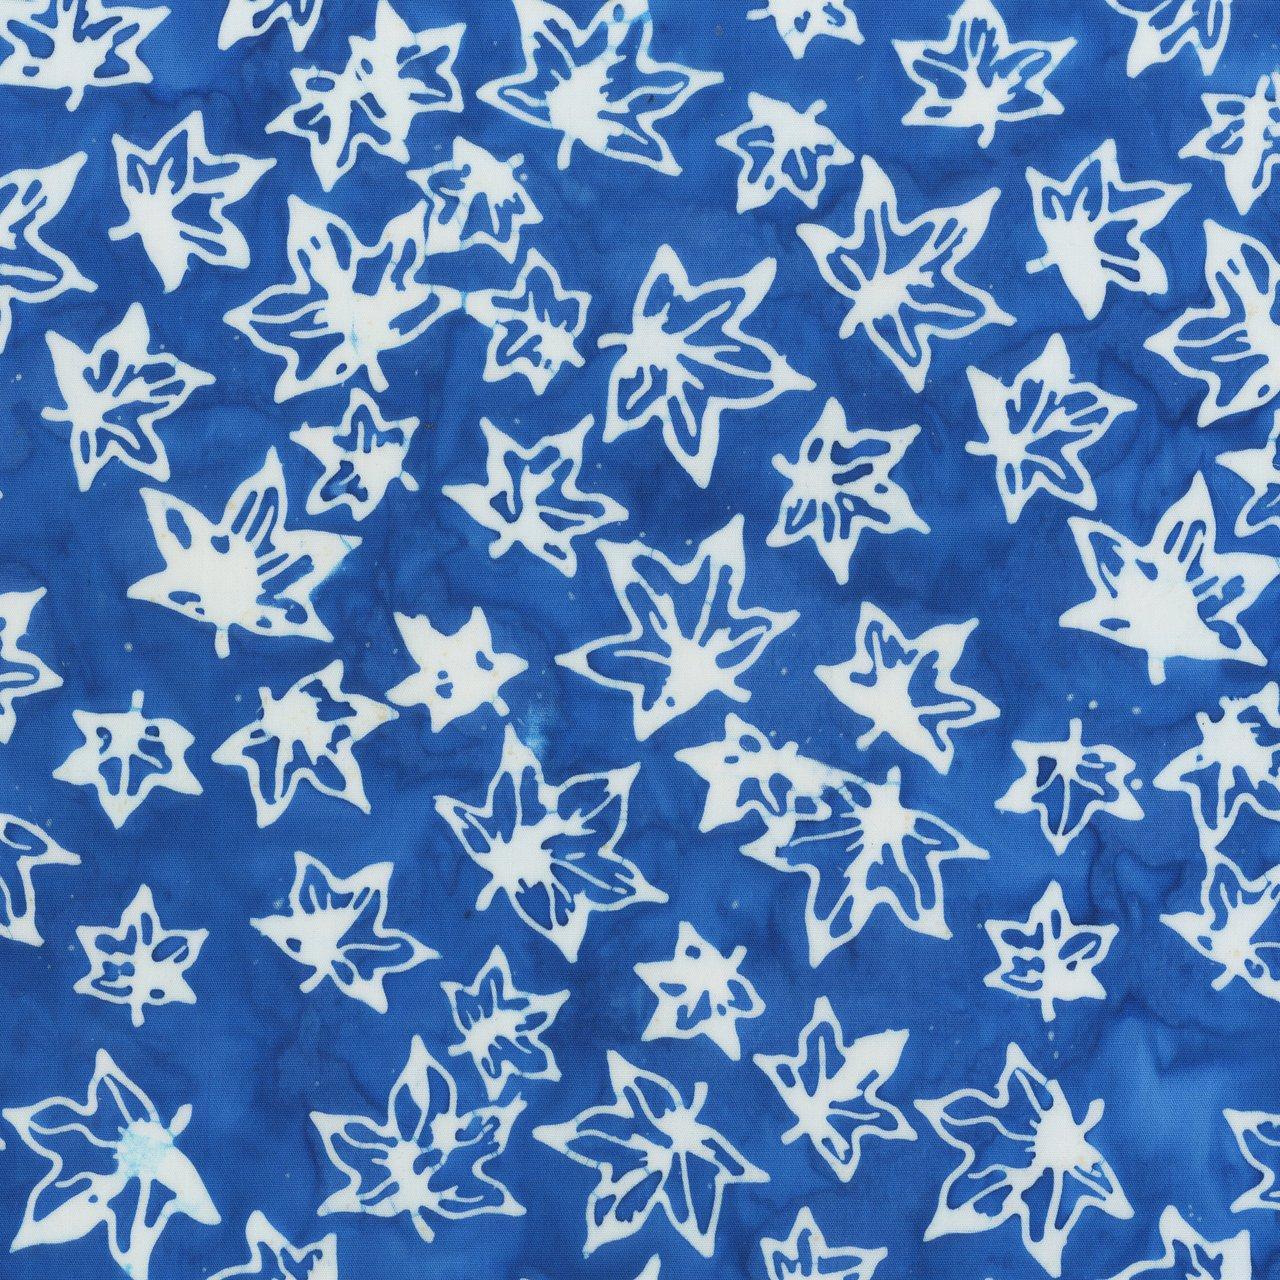 349Q-2 Sky by Jacqueline De Jonge for Anthology Fabrics